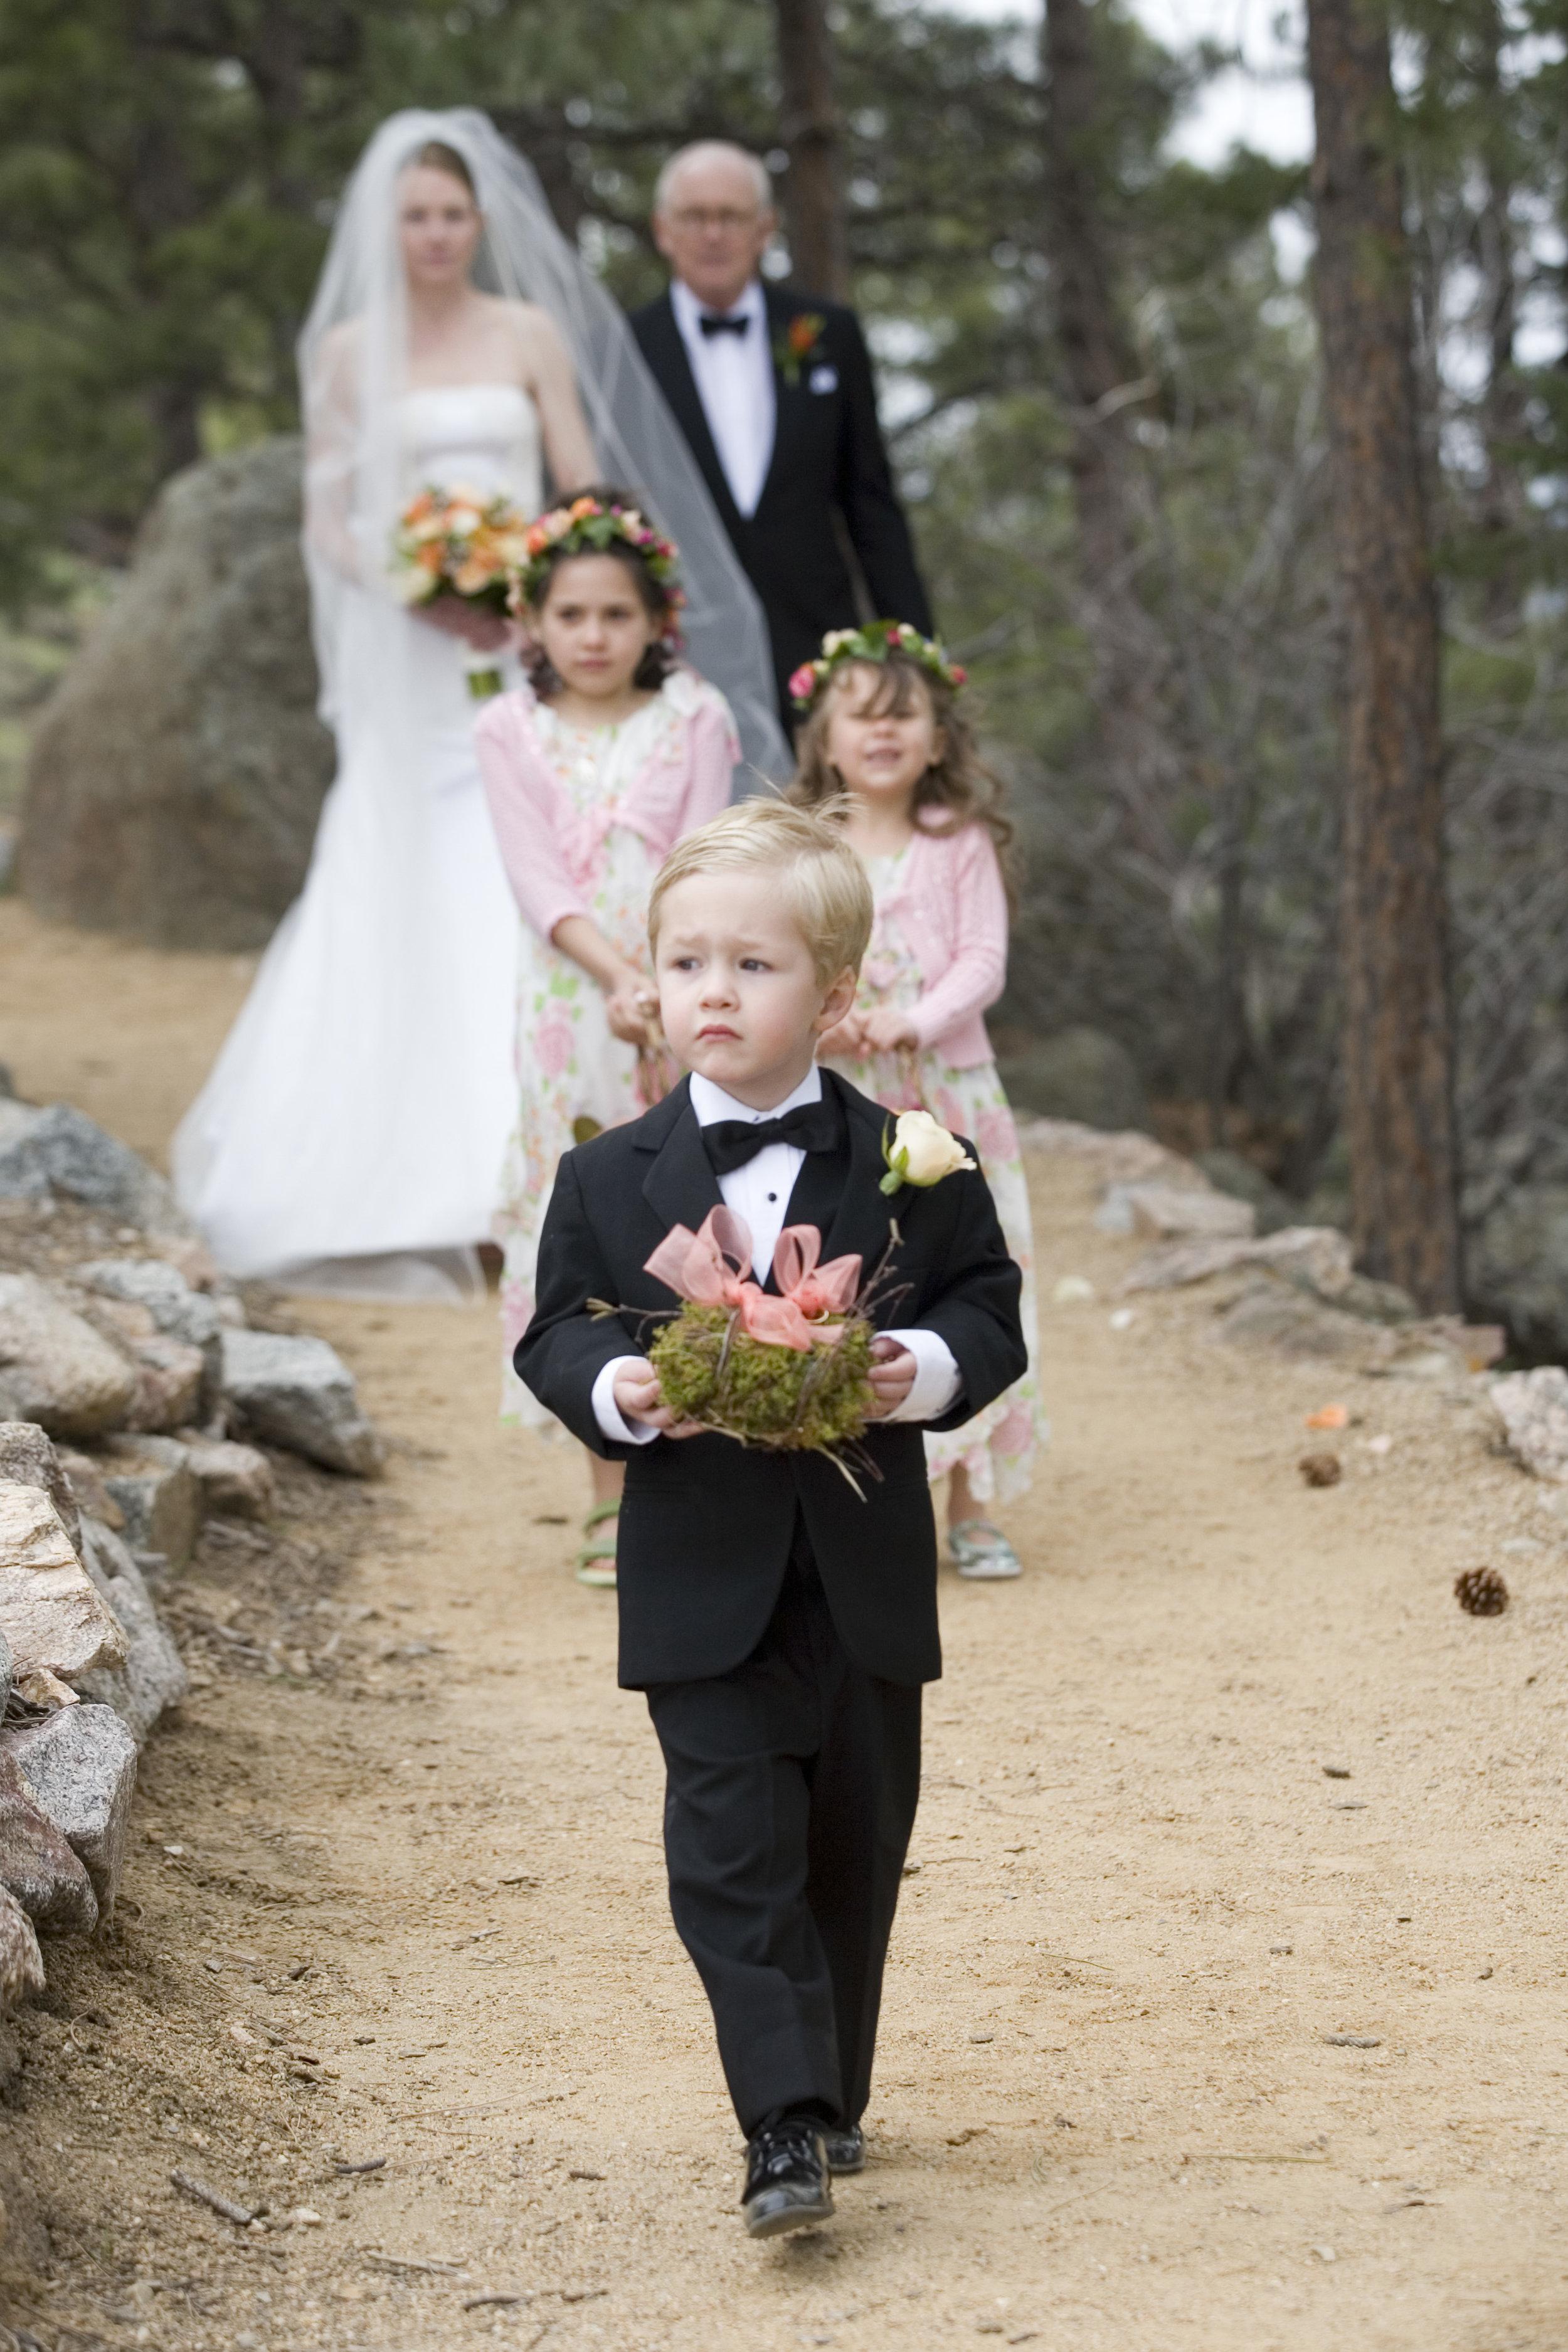 boulder-wedding-photographer-axelphoto.jpg